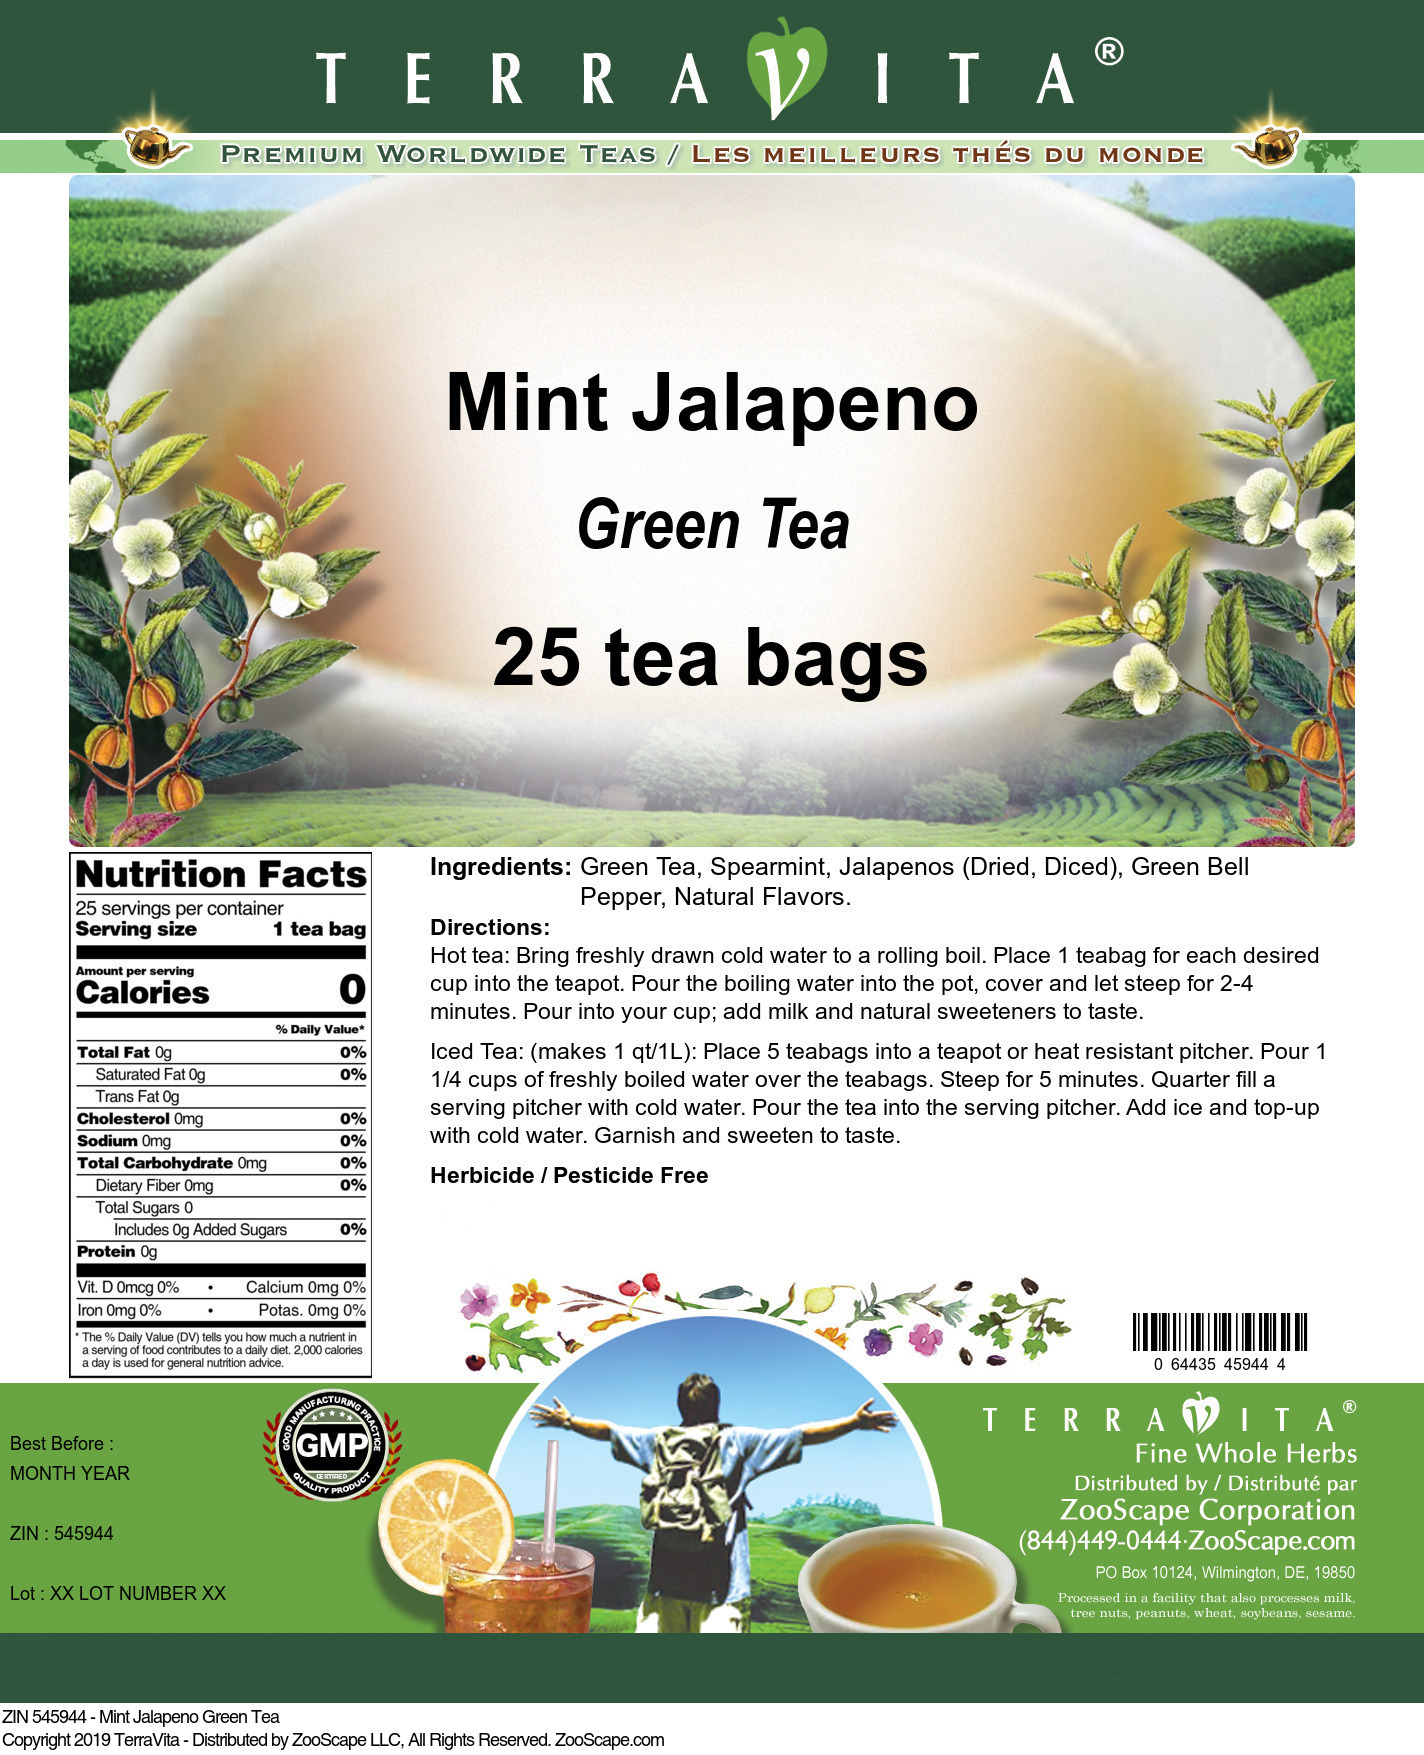 Mint Jalapeno Green Tea